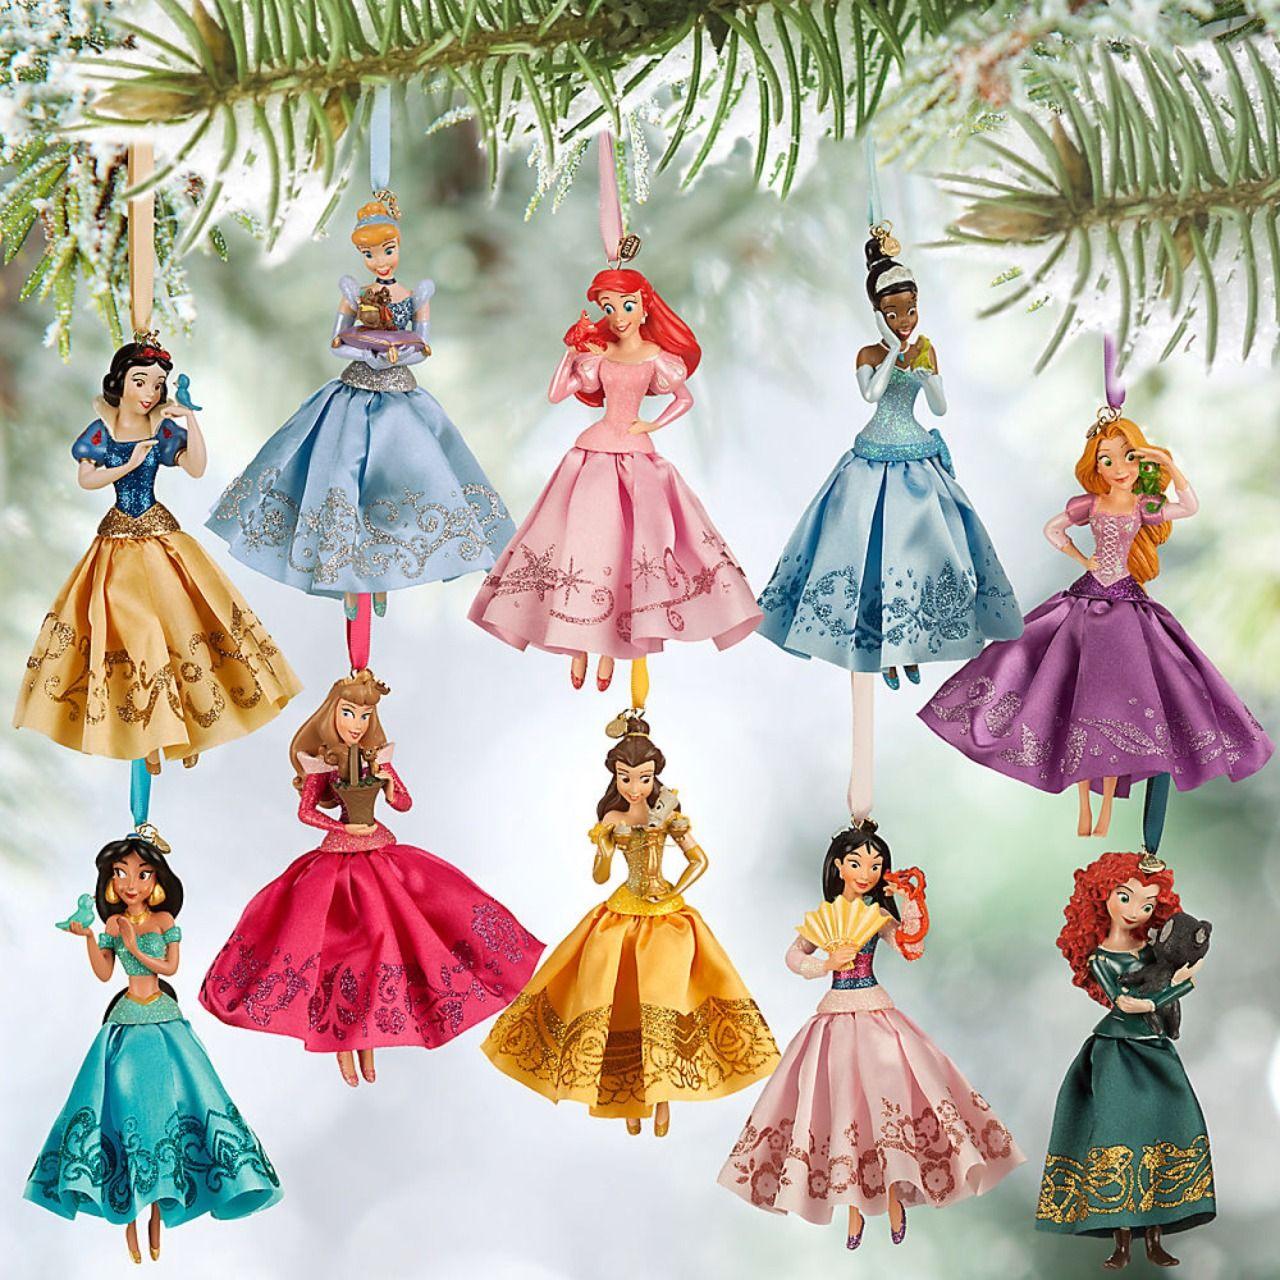 Mmdisney Doll Collection Disney Princess Sketchbook Ornament Set Disney Christmas Ornaments Disney Christmas Tree Disney Princess Ornaments